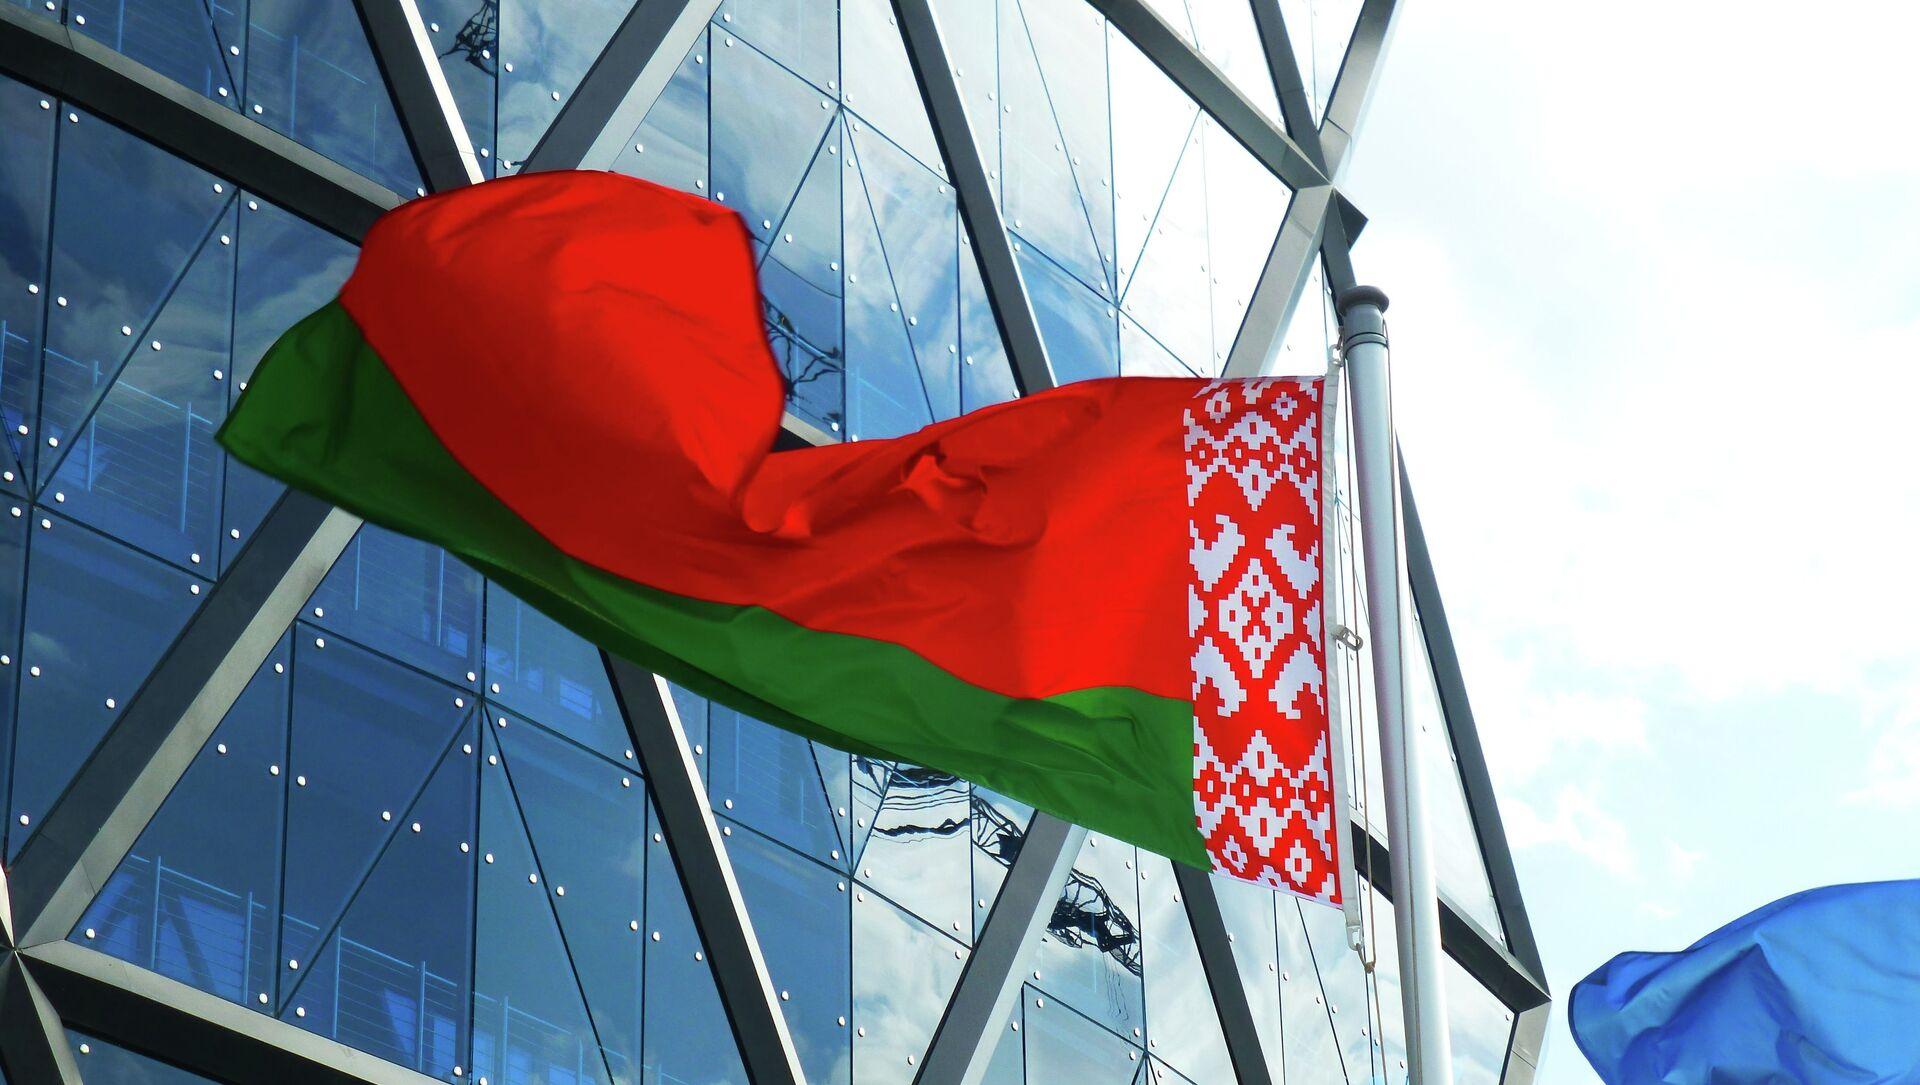 flaga białorusi - Sputnik Polska, 1920, 25.05.2021